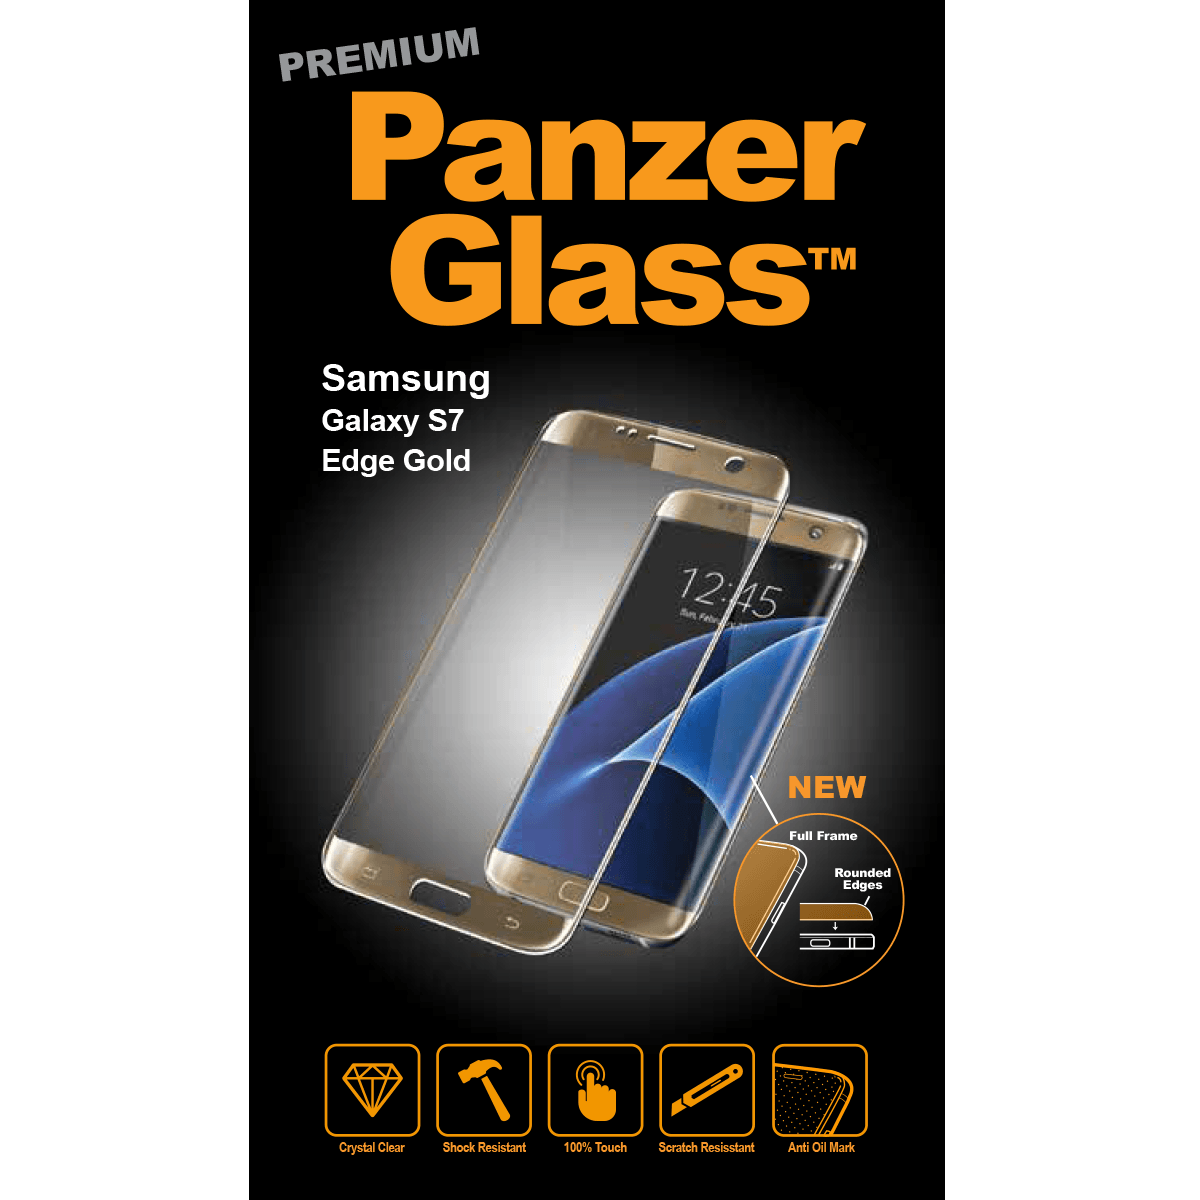 Ochranné sklo PanzerGlass PREMIUM Full Frame na Samsung Galaxy S7 Edge - ZLATÉ